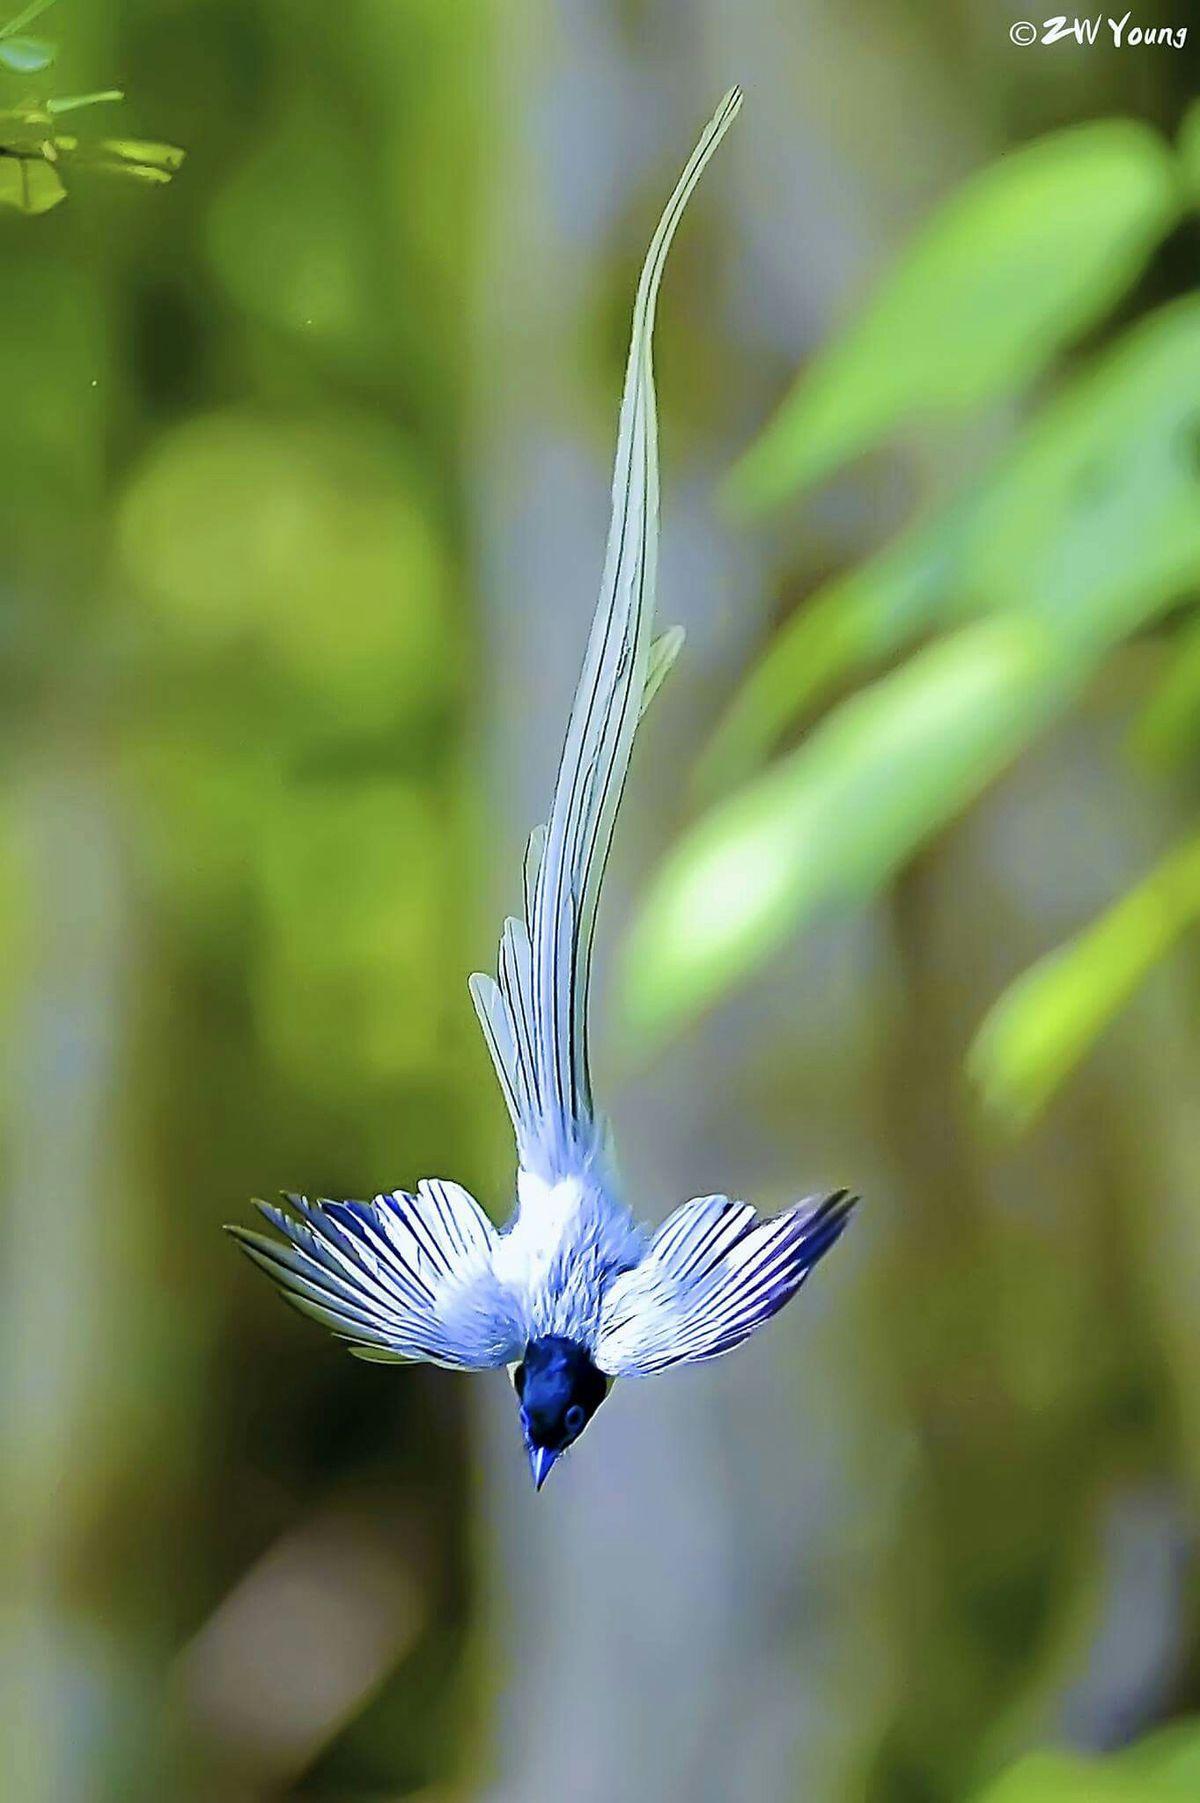 Asian Paradise Flycatcher (male, white morph) is a medium